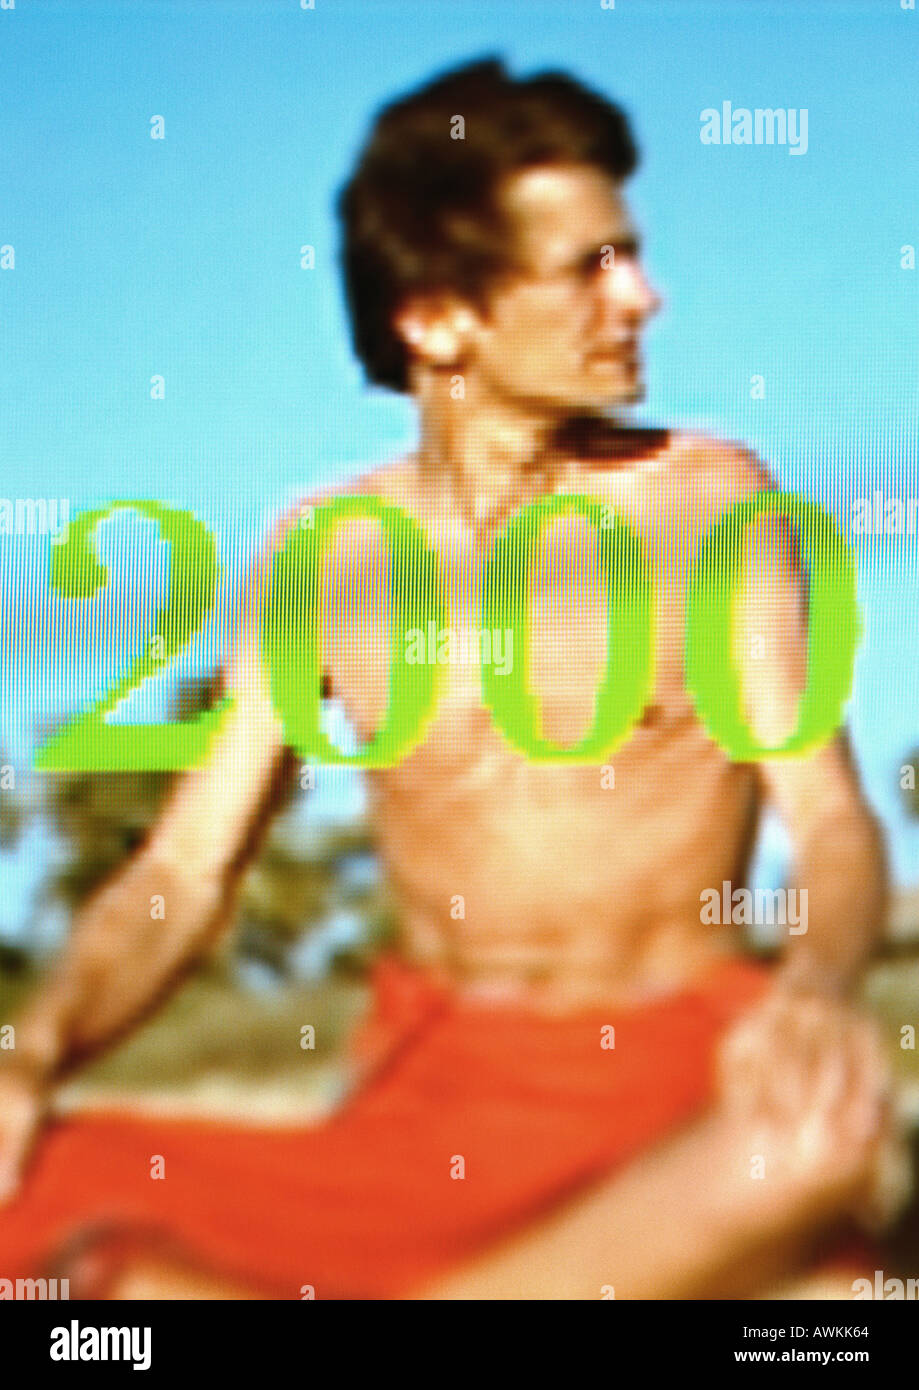 Man on beach in loincloth, '2000' - Stock Image